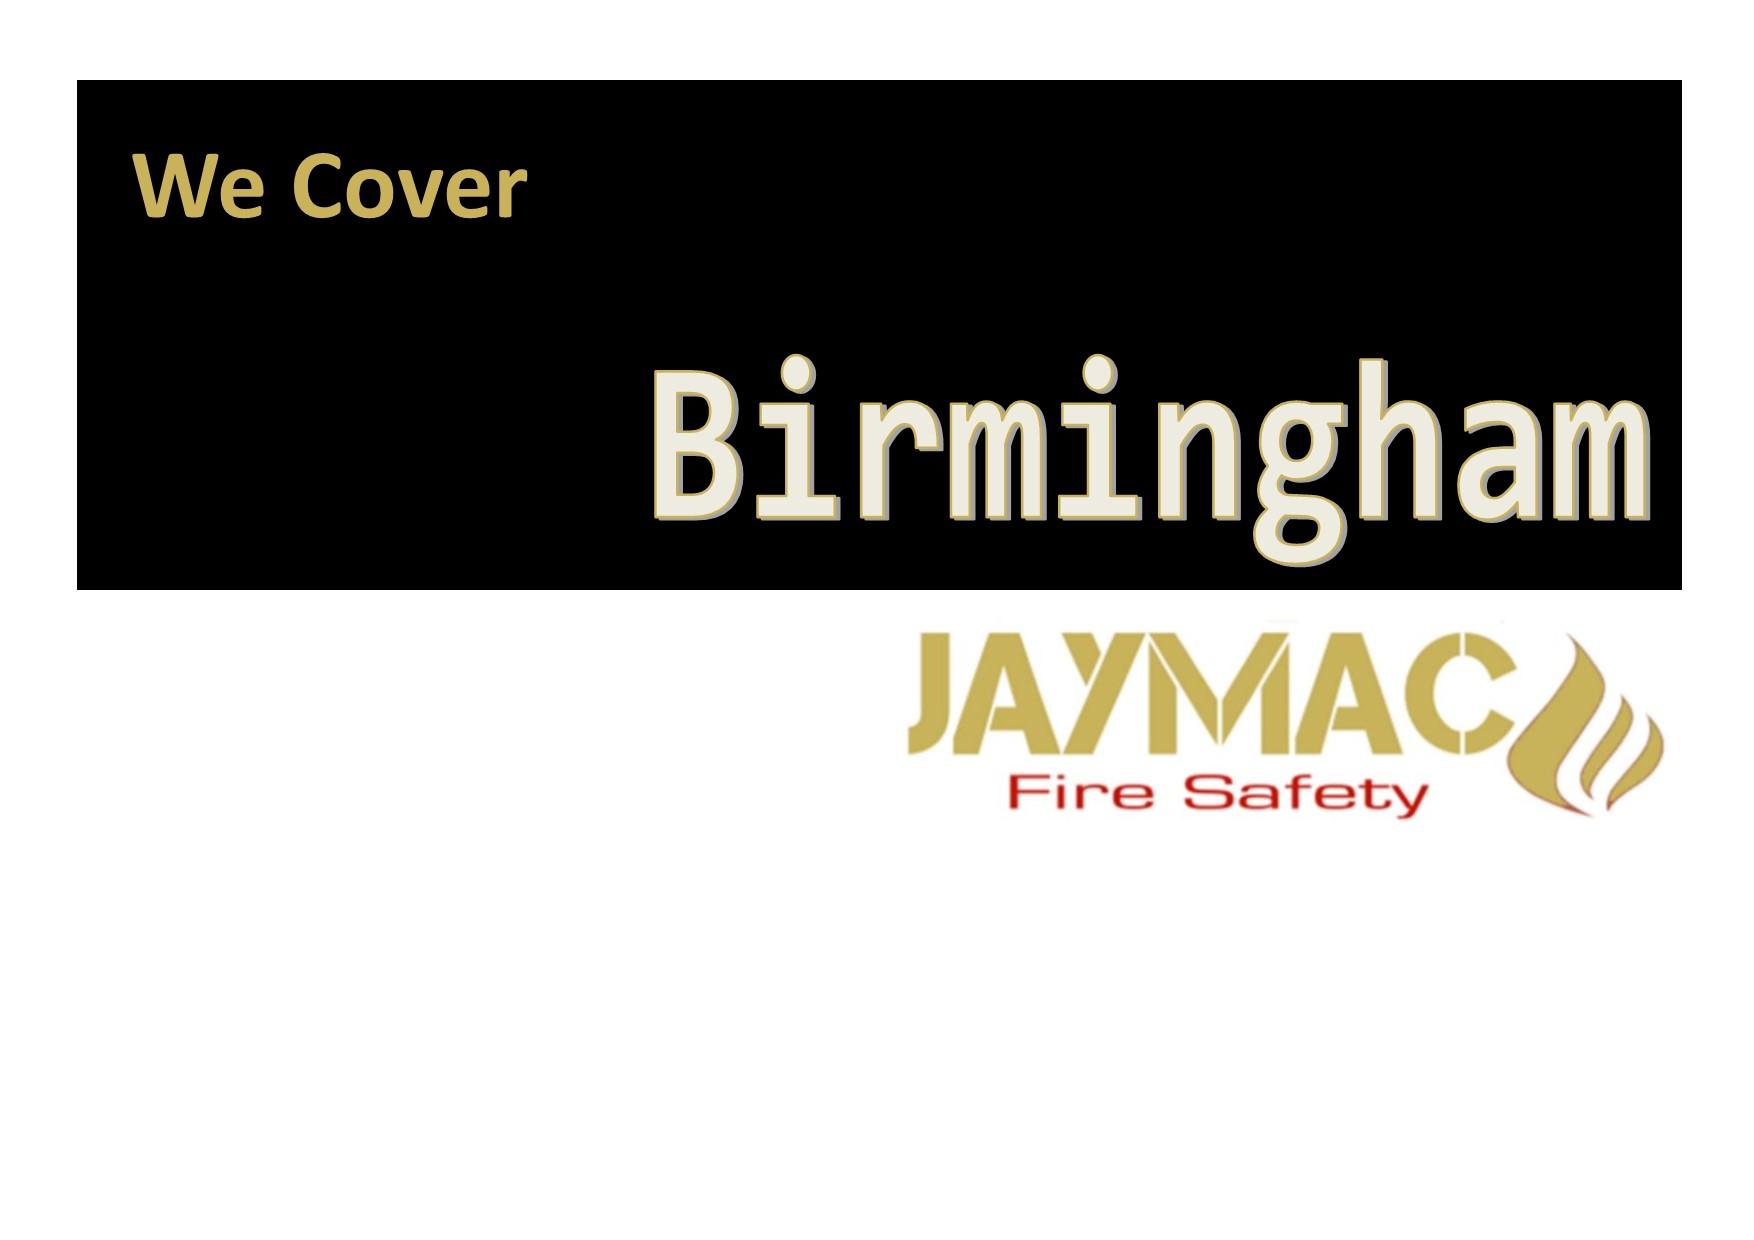 We Cover Bham